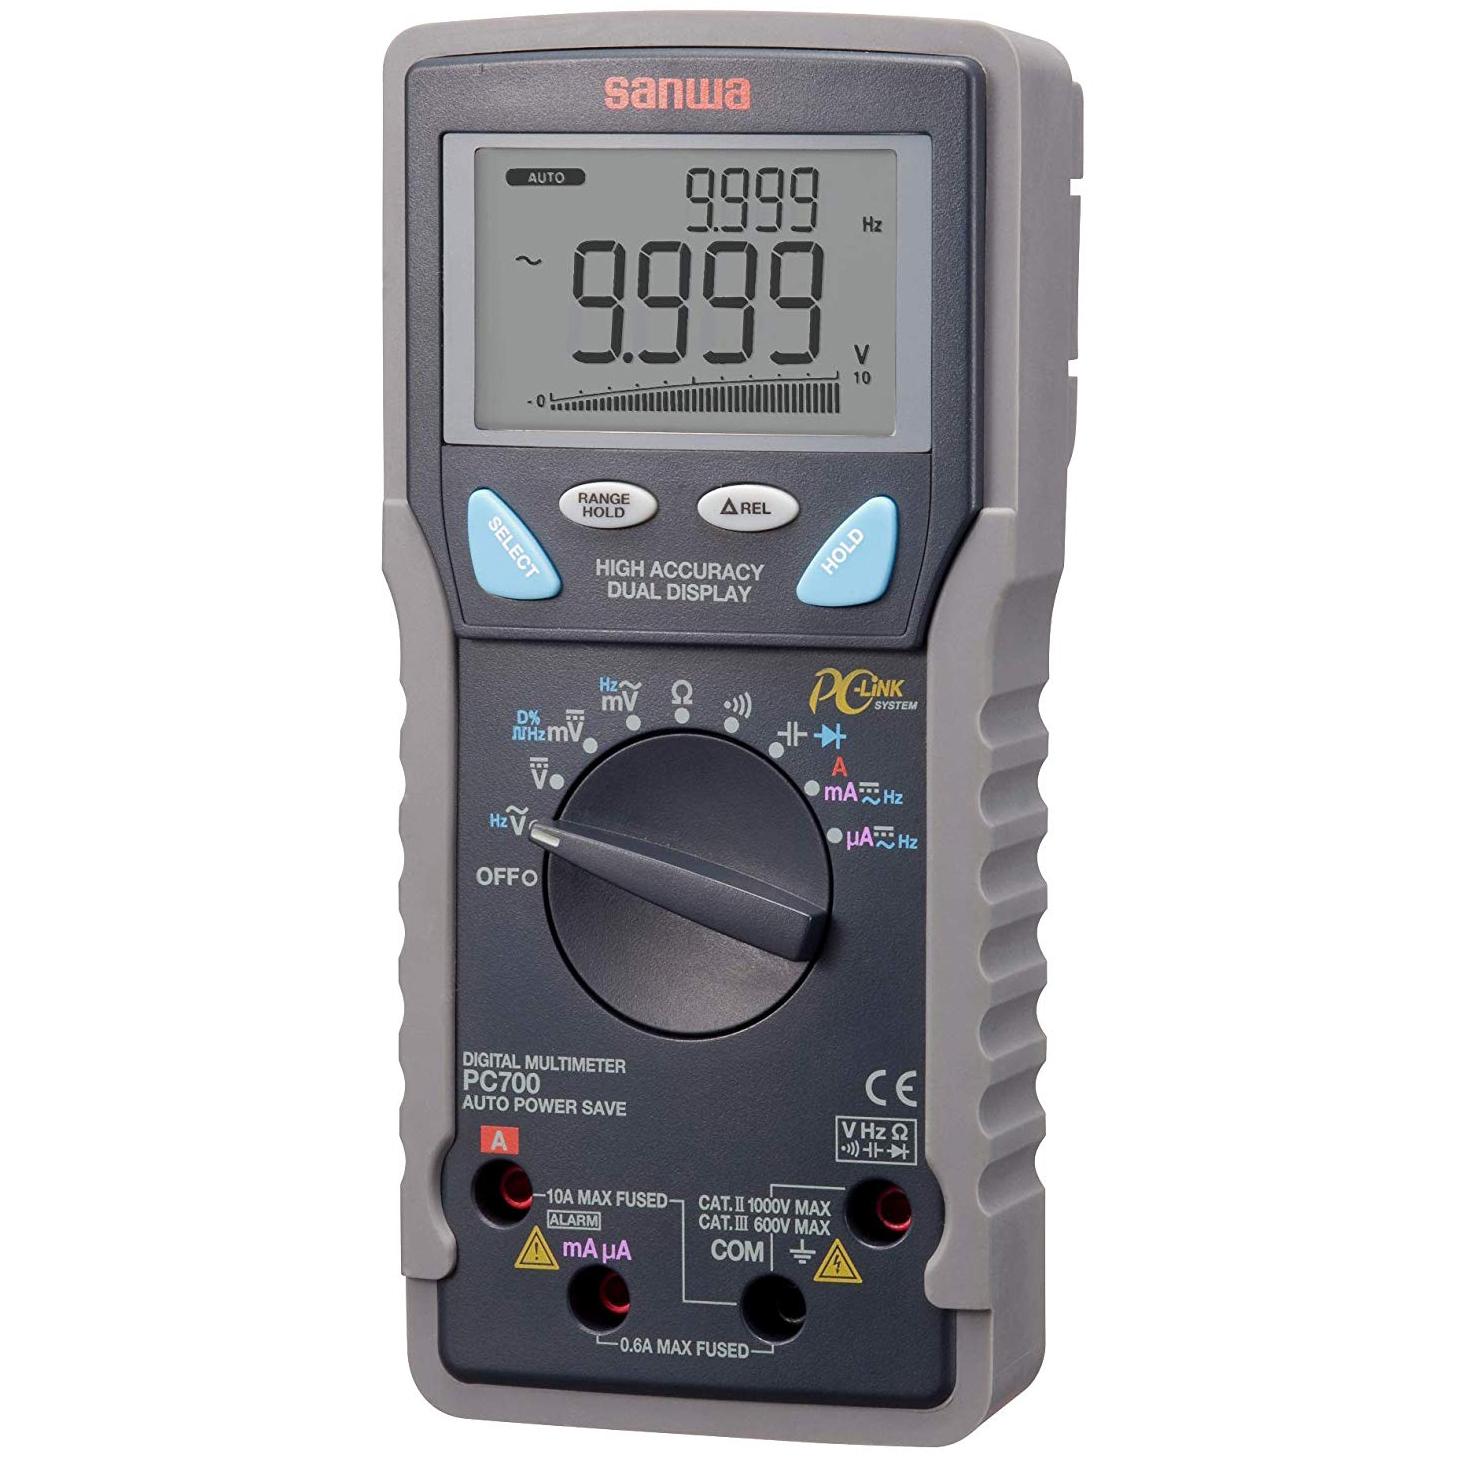 FMUSER SANWA PC700 Advanced Intelligent Digital Multimeter поўная абарона ад перагрузкі для сувязі з ПК